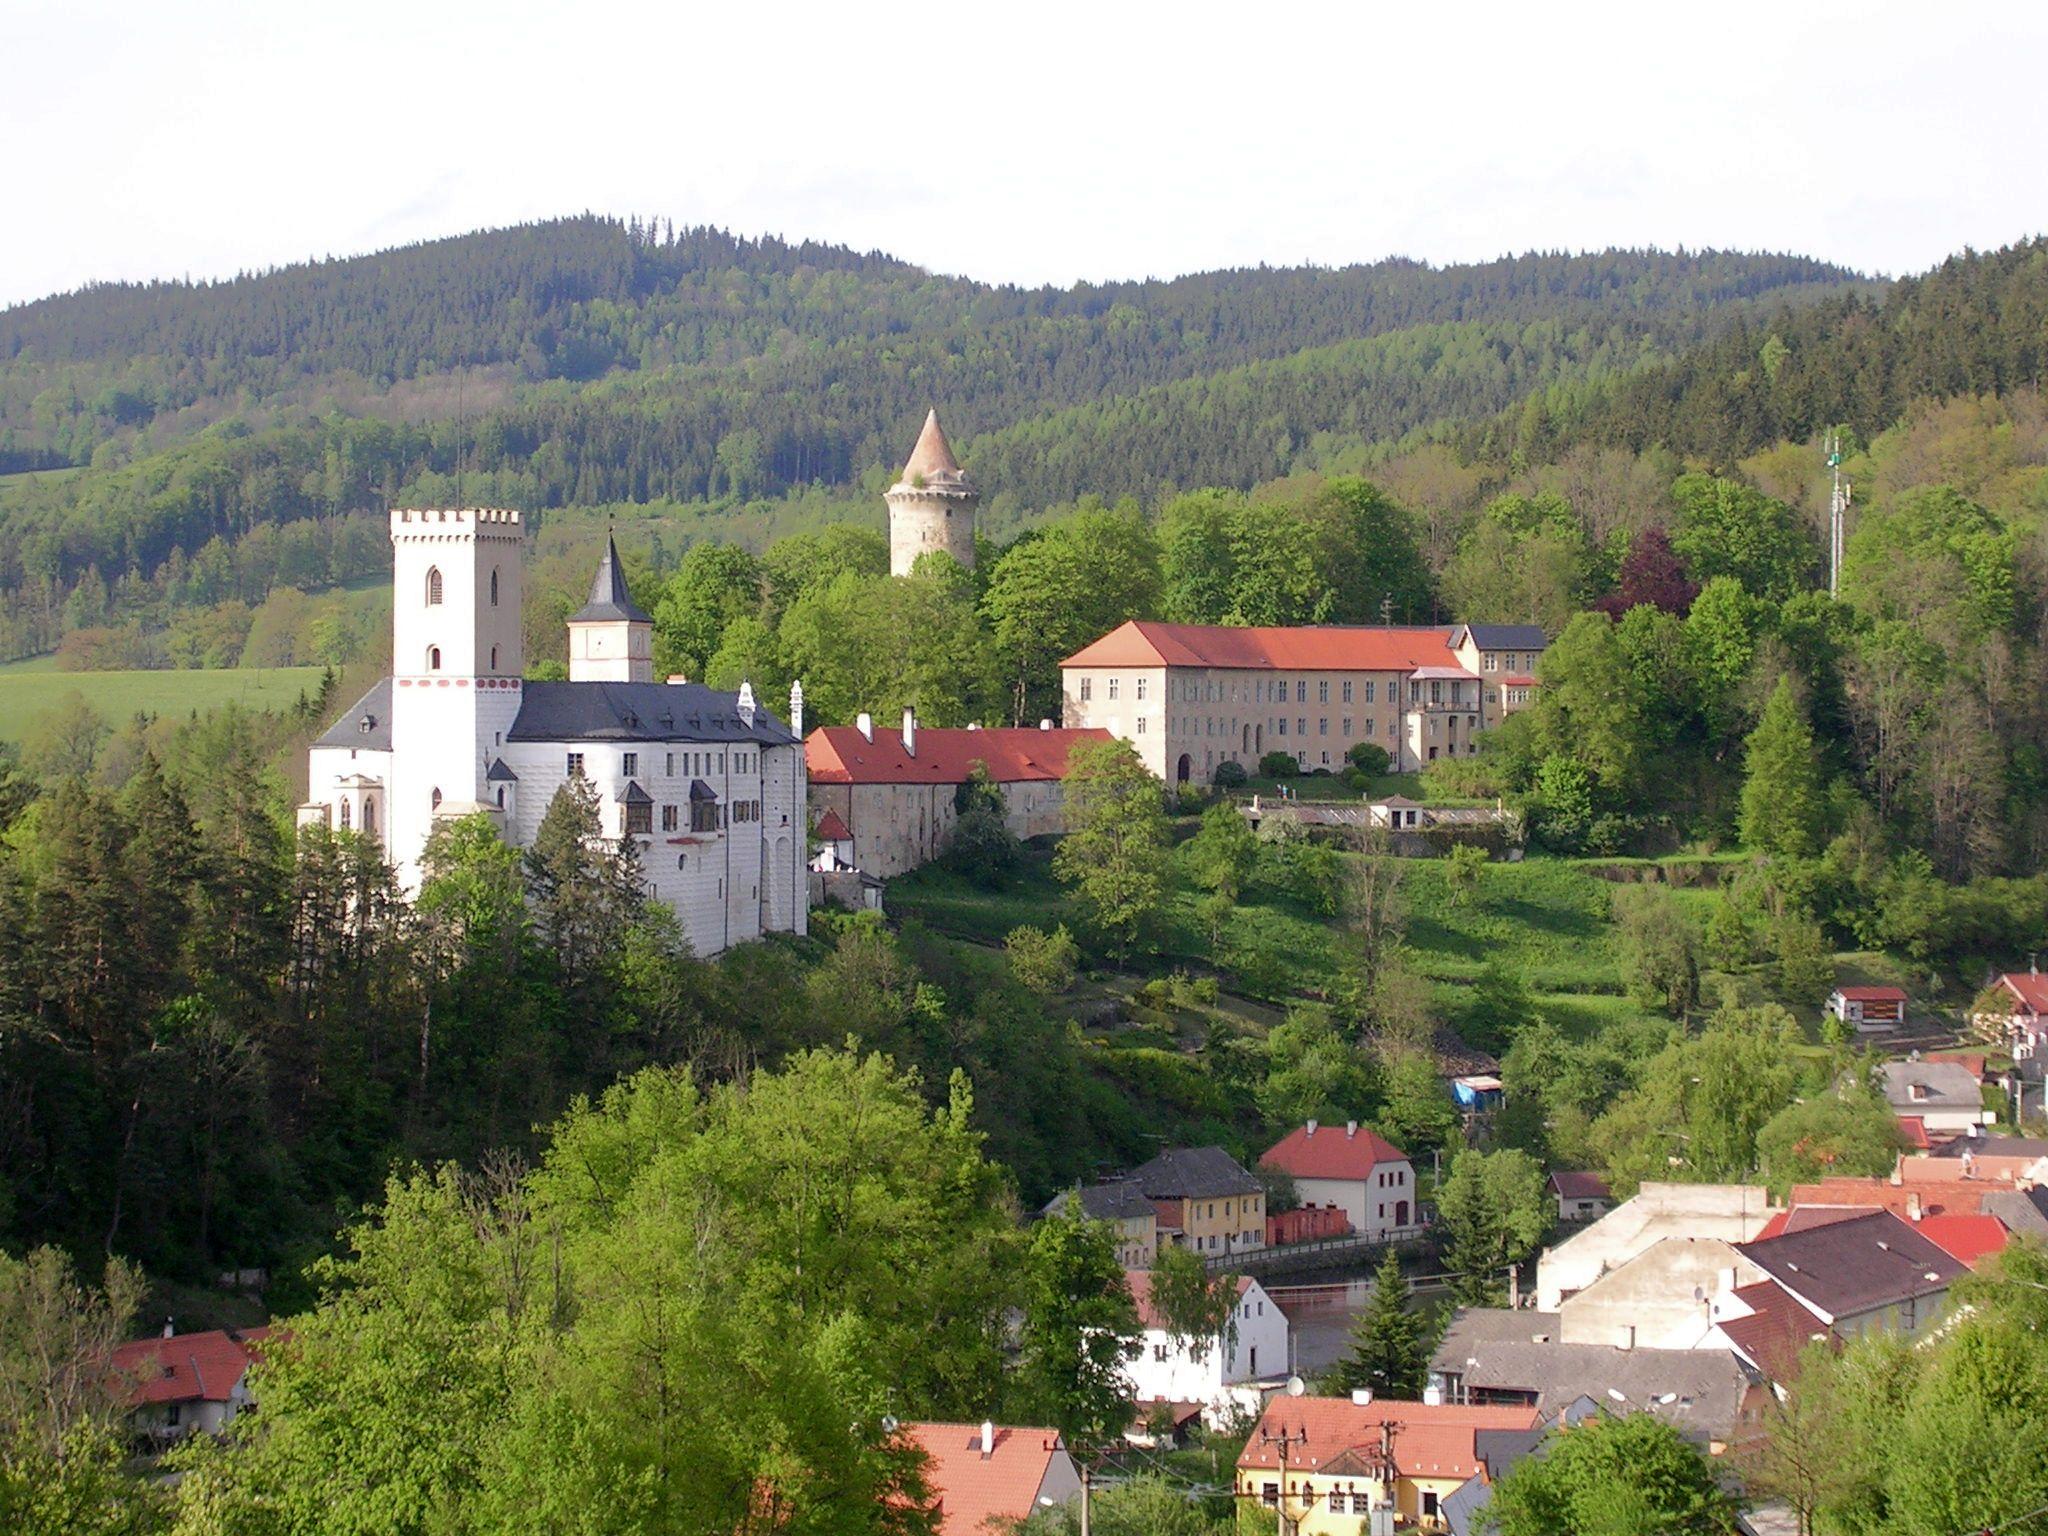 Rožmberk castle © Sju